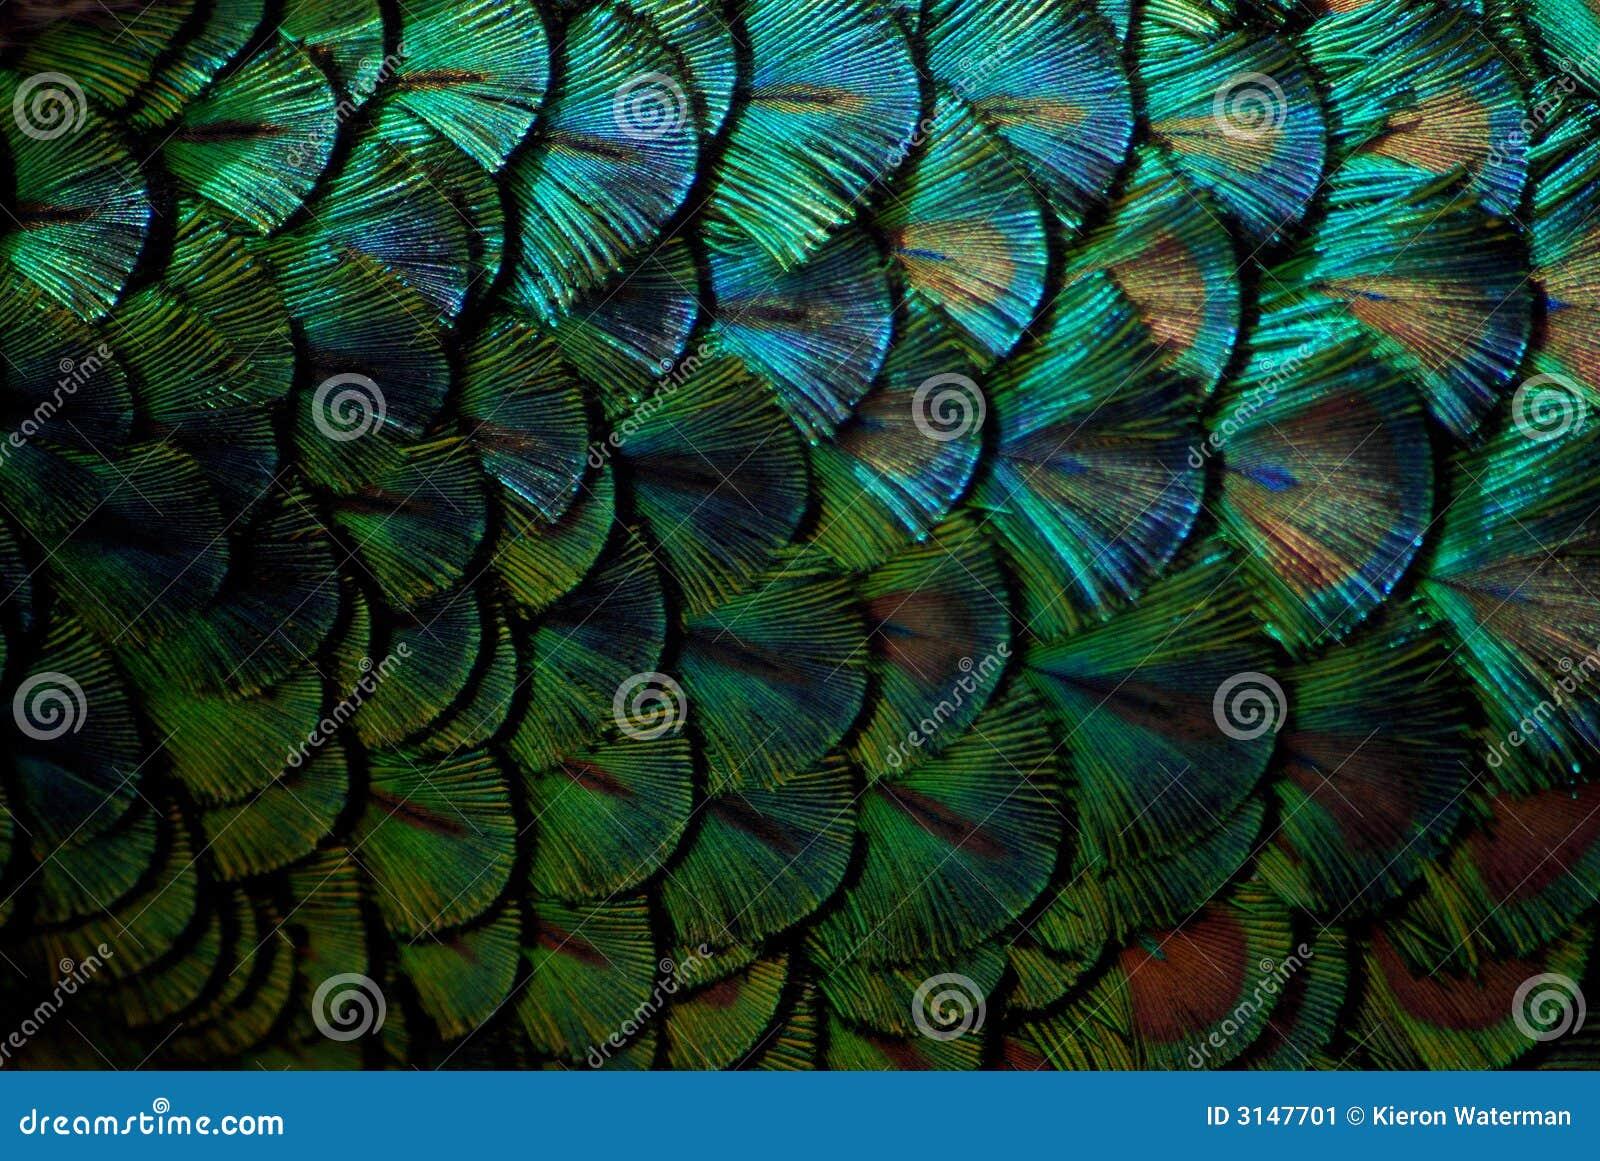 Plumas del pavo real en macro